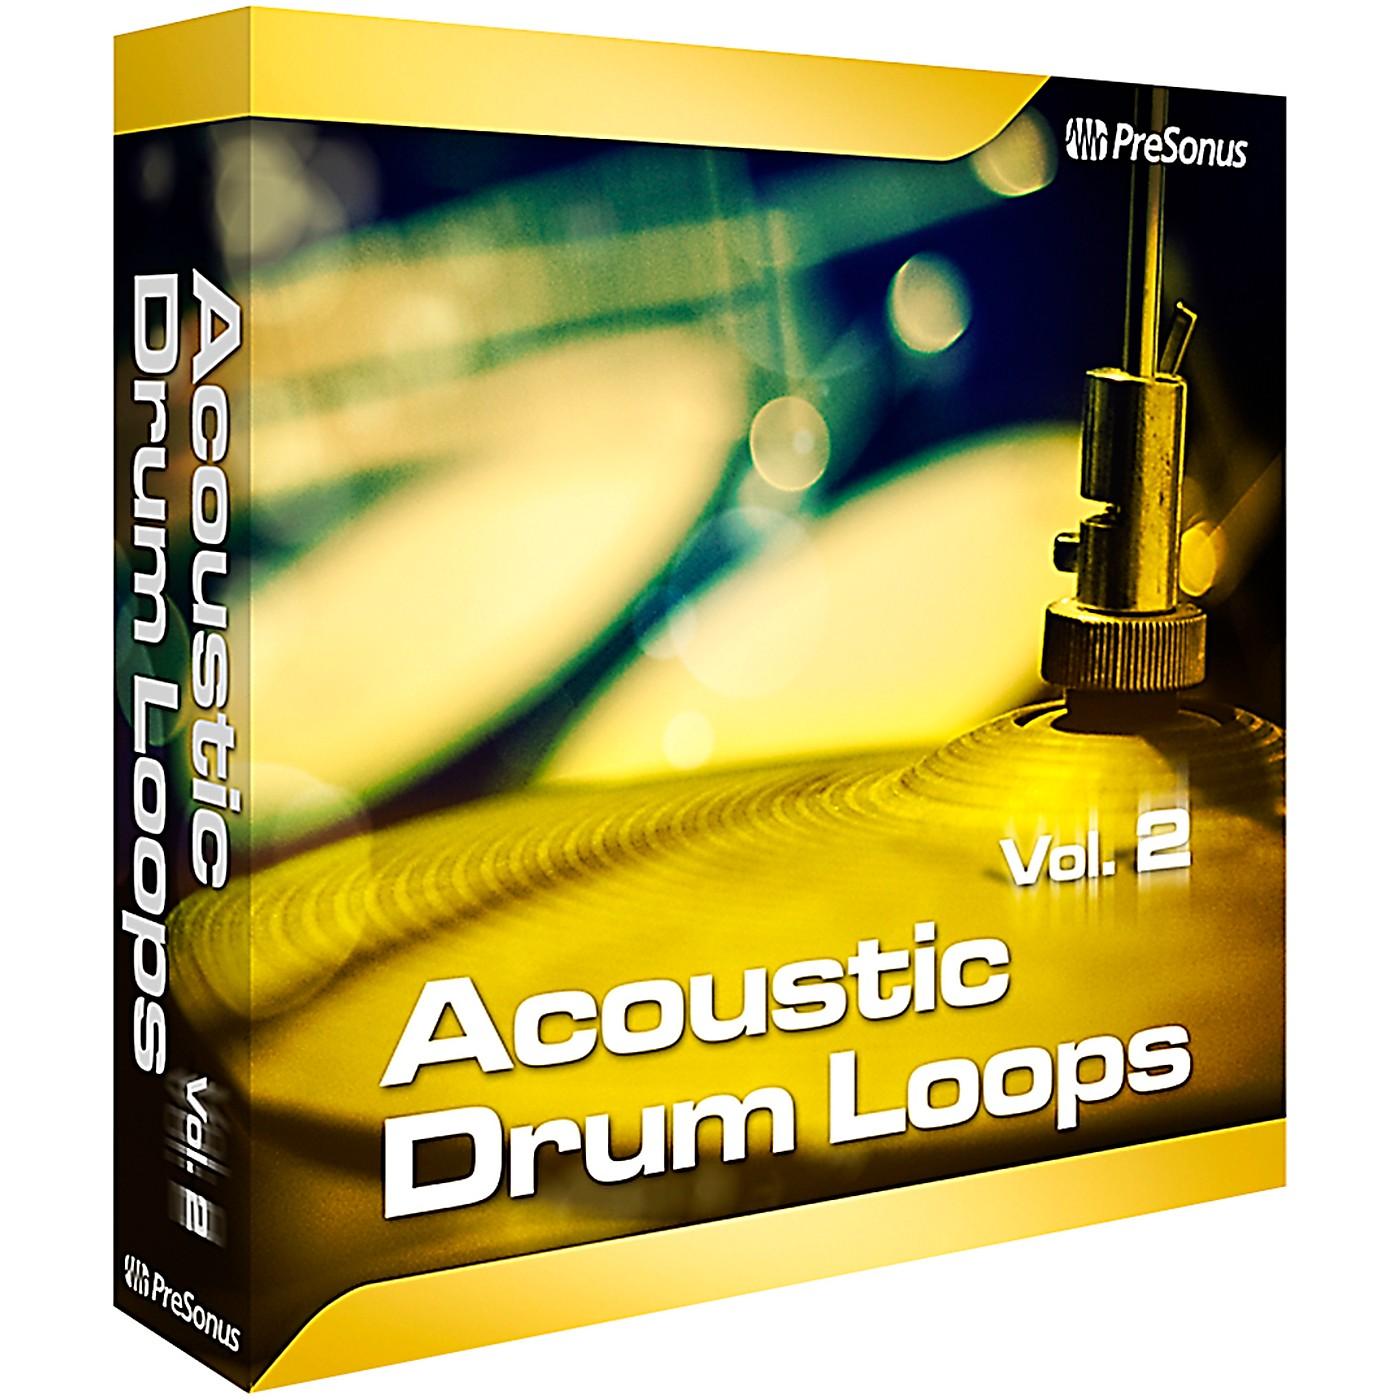 Presonus Acoustic Drum Loops Vol. 2 - Stereo Software Download thumbnail